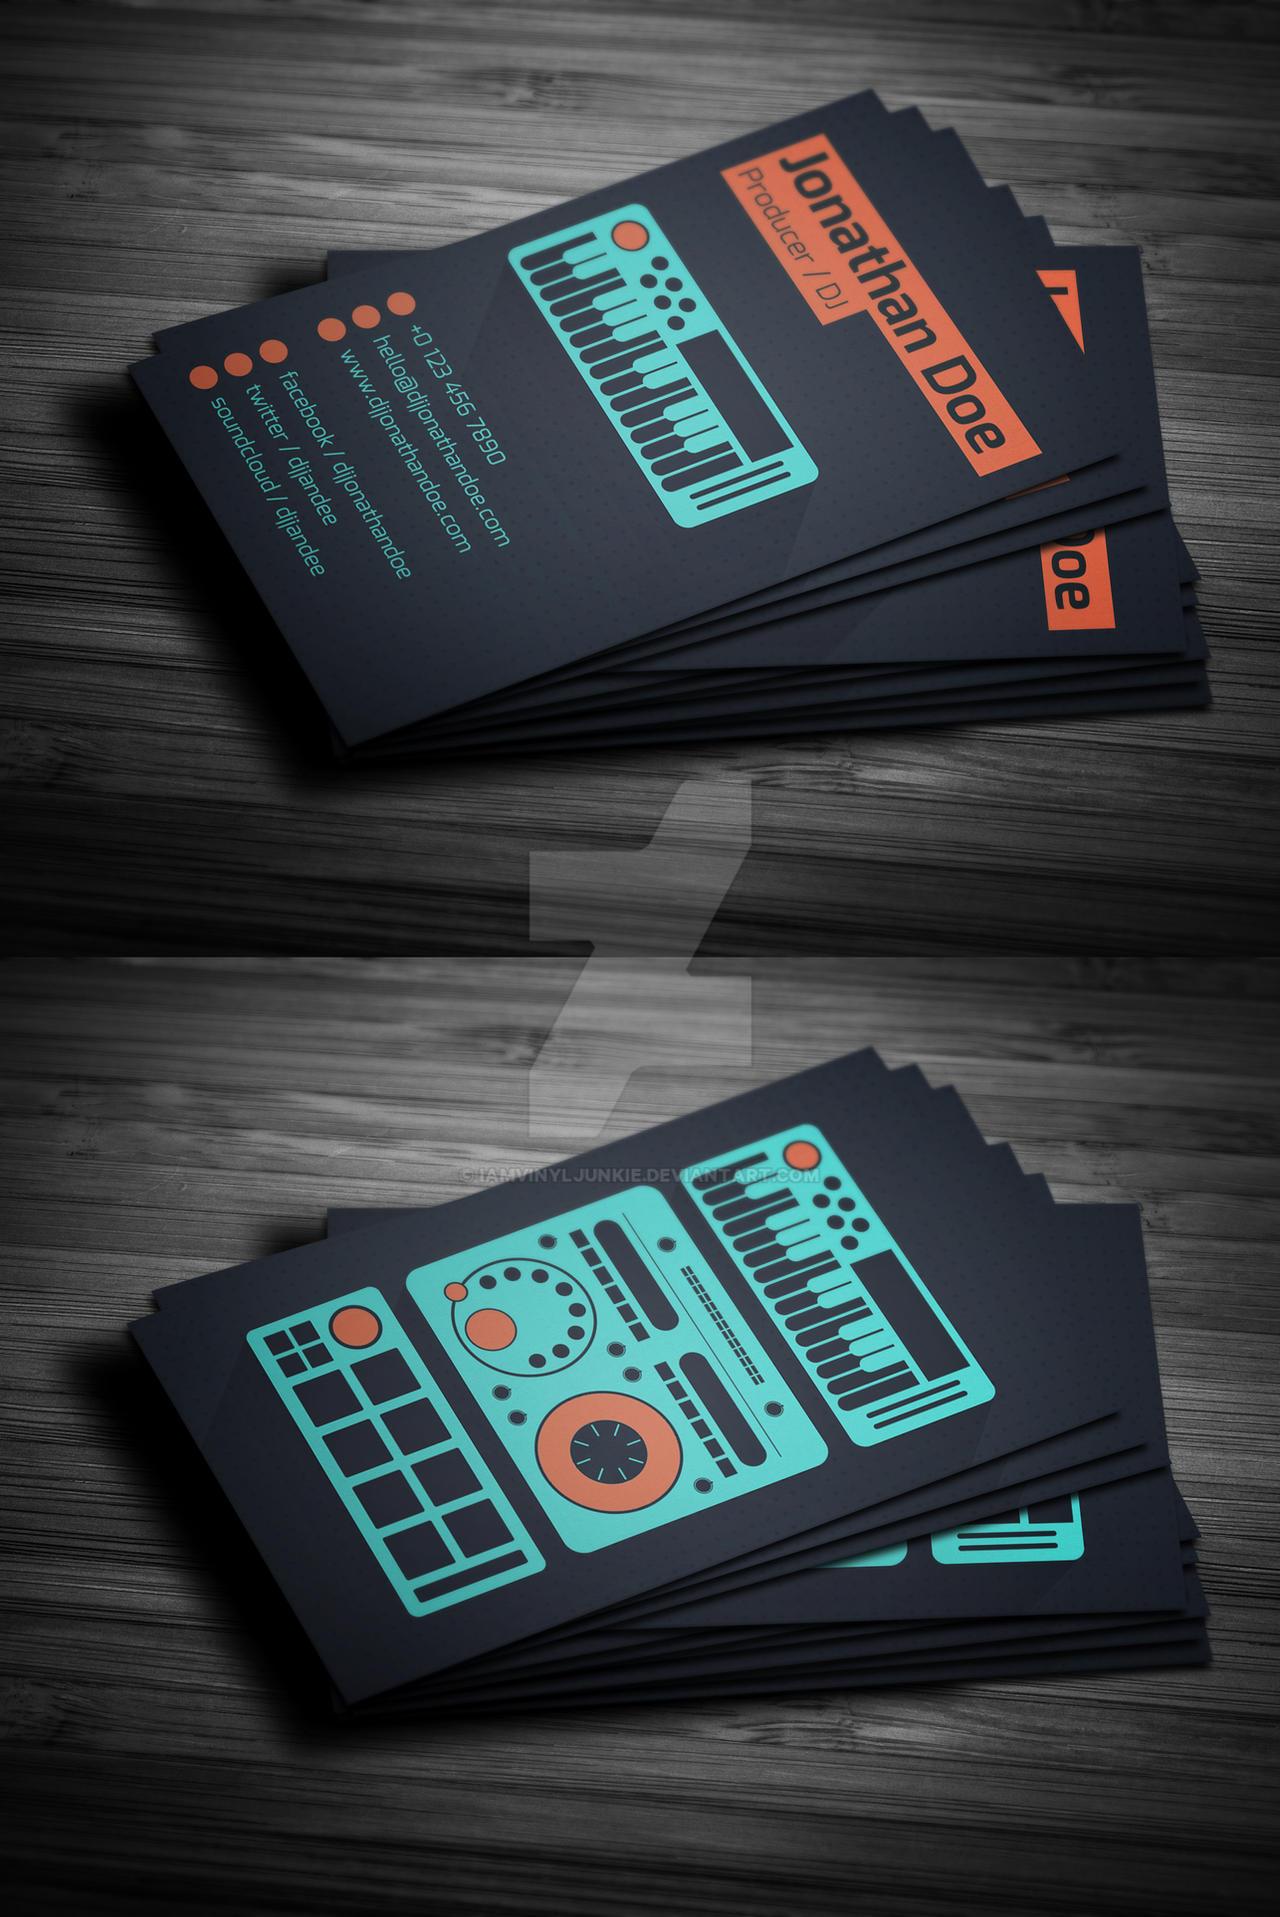 flat producer  dj business card psd templateiamvinyljunkie